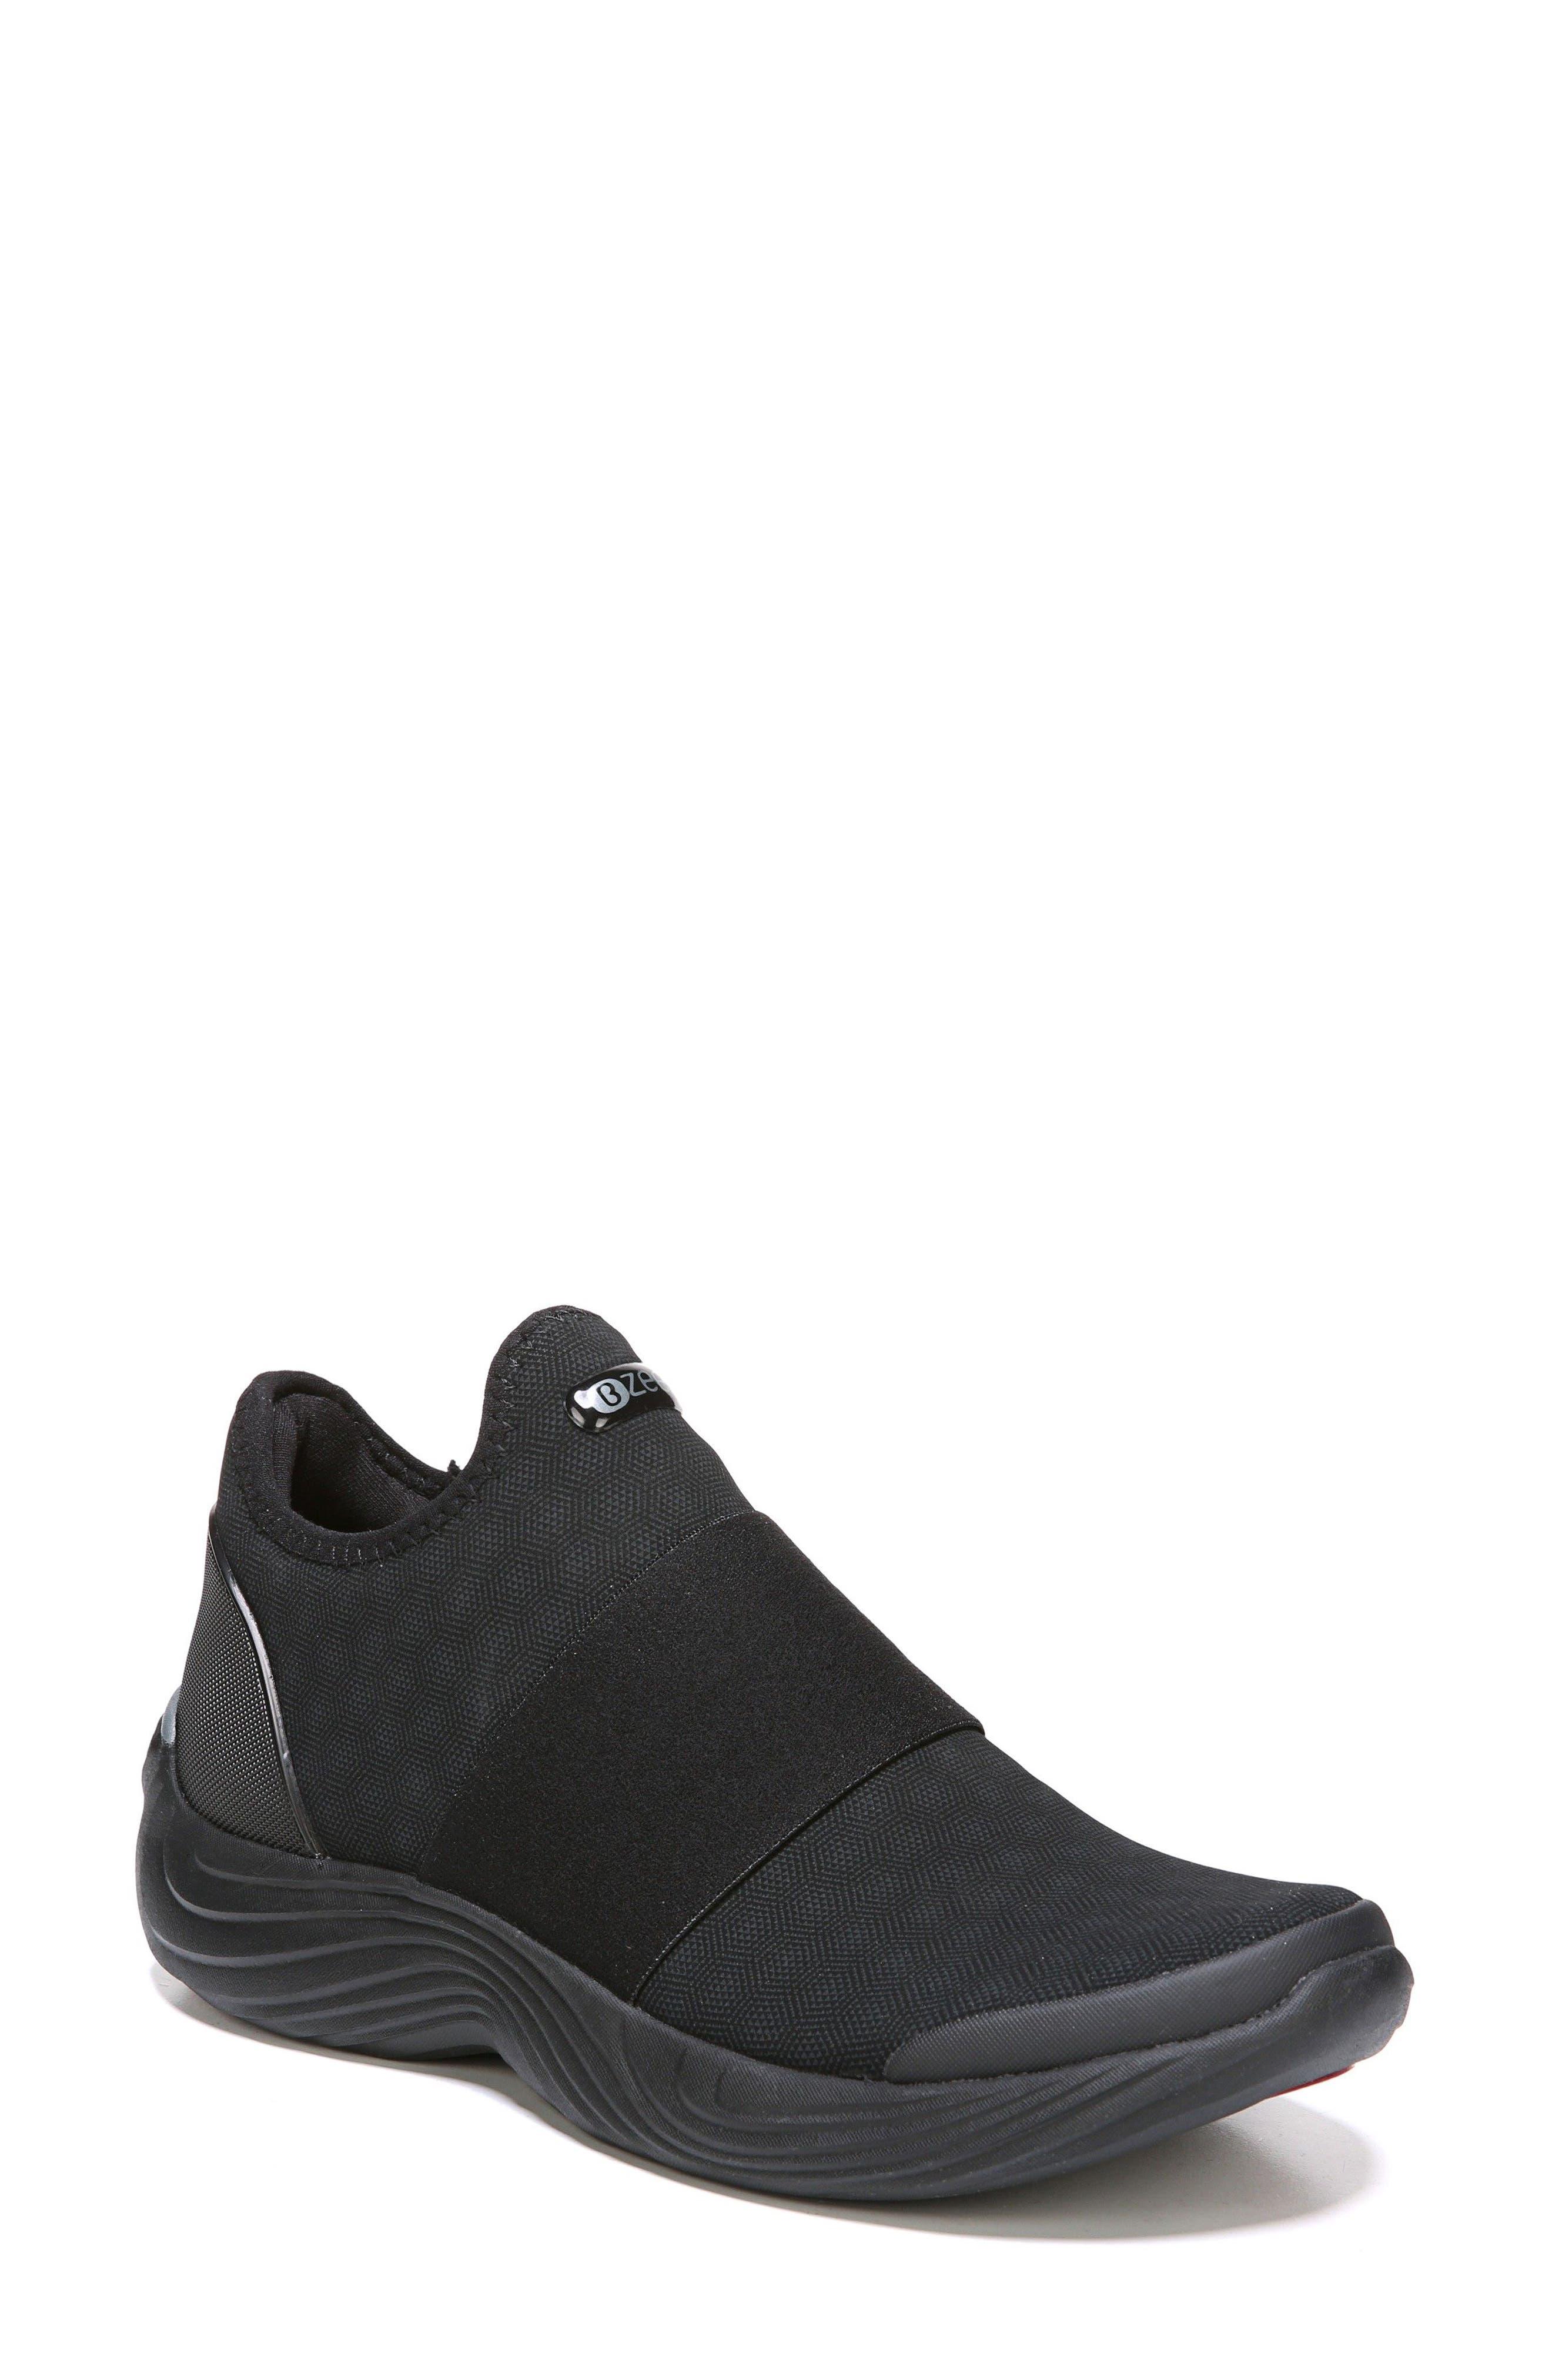 Terri Slip-On Sneaker,                             Main thumbnail 1, color,                             001